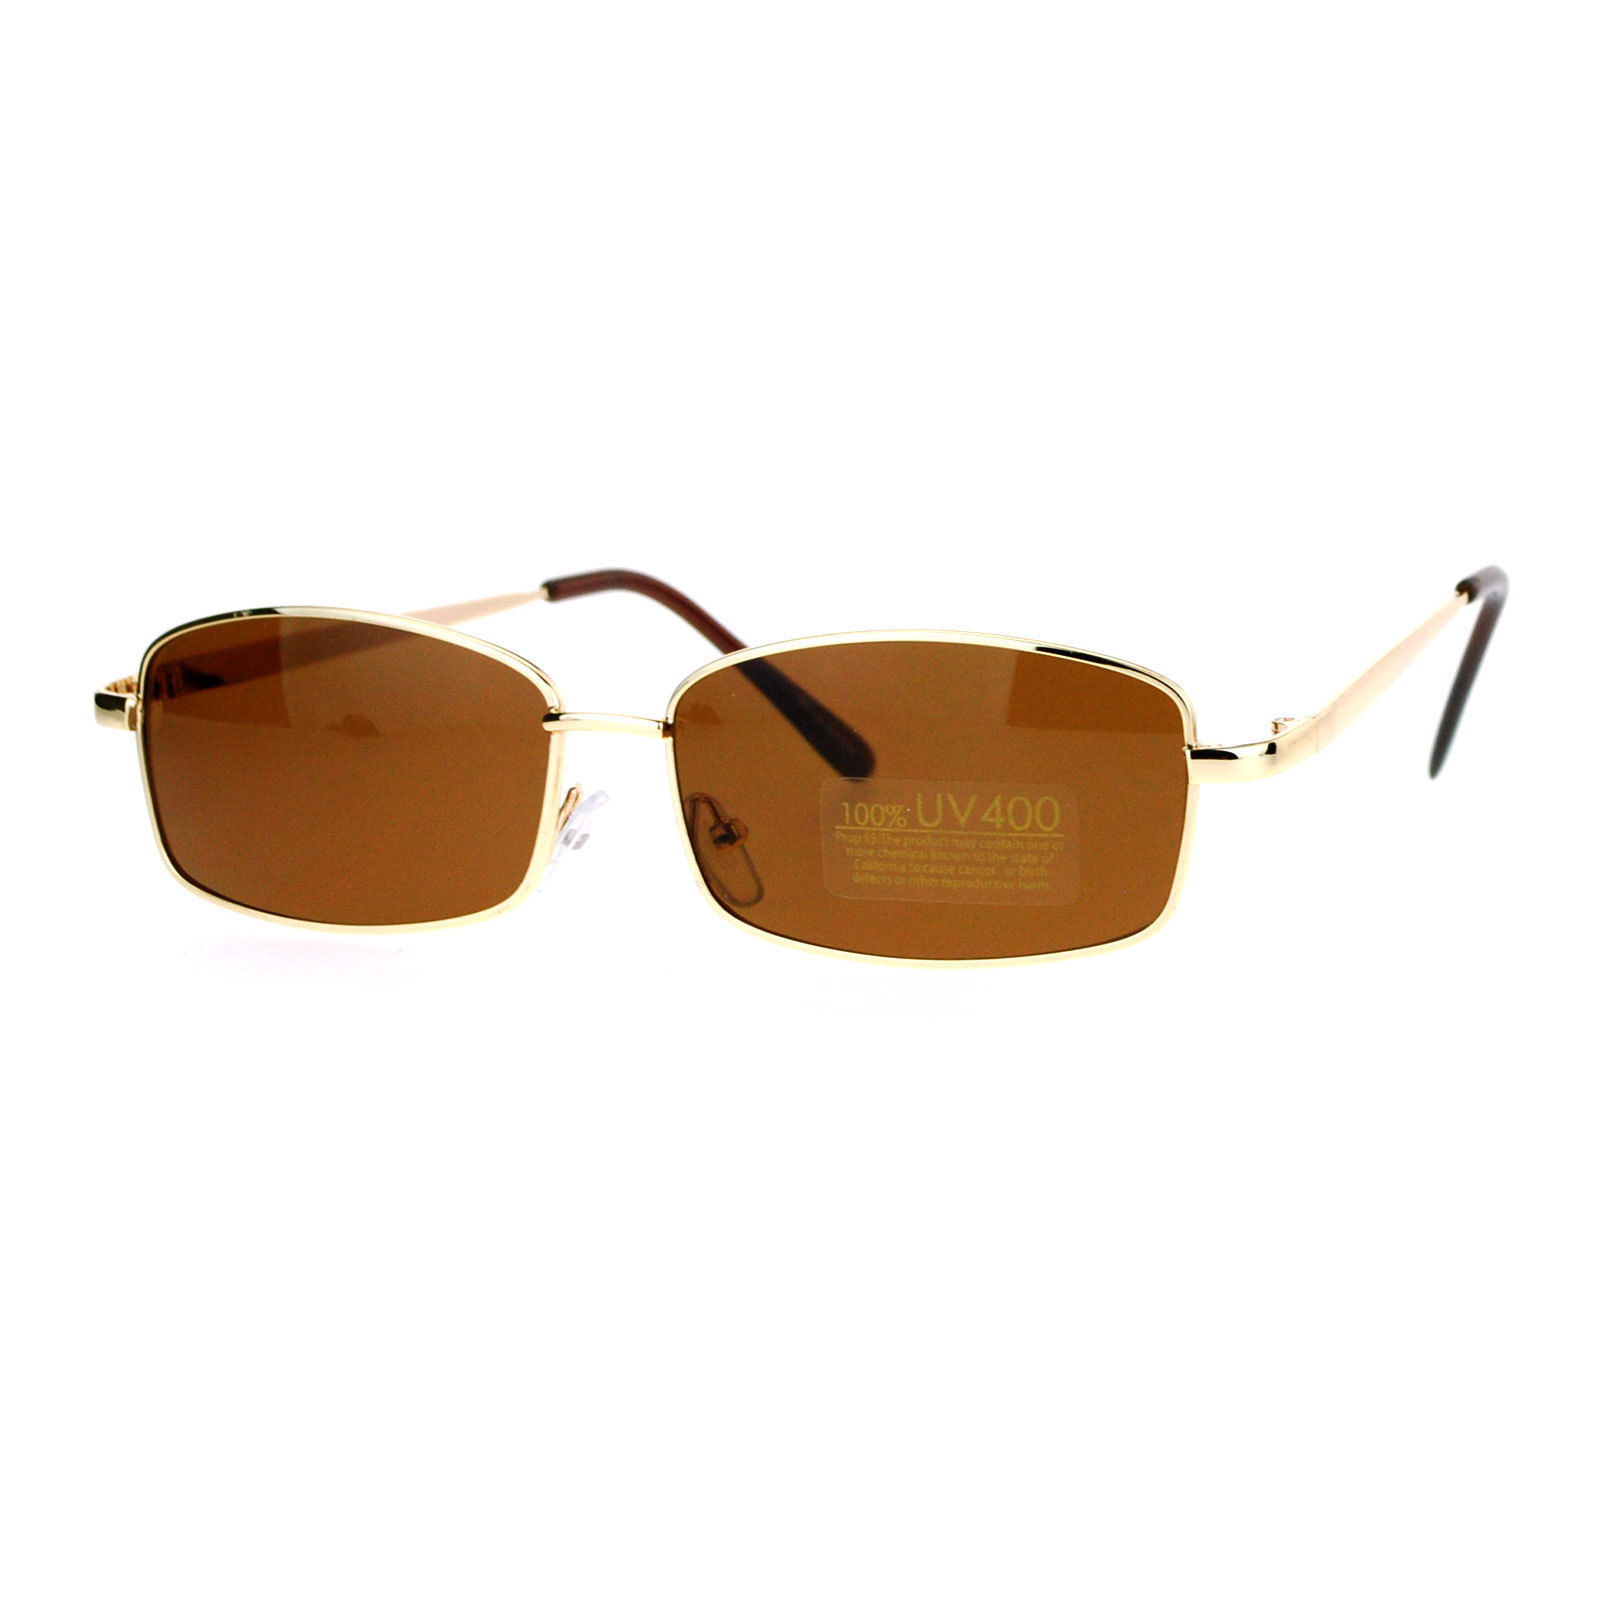 Oval Rectangular Sunglasses Unisex Classic Thin Metal Frame UV 400